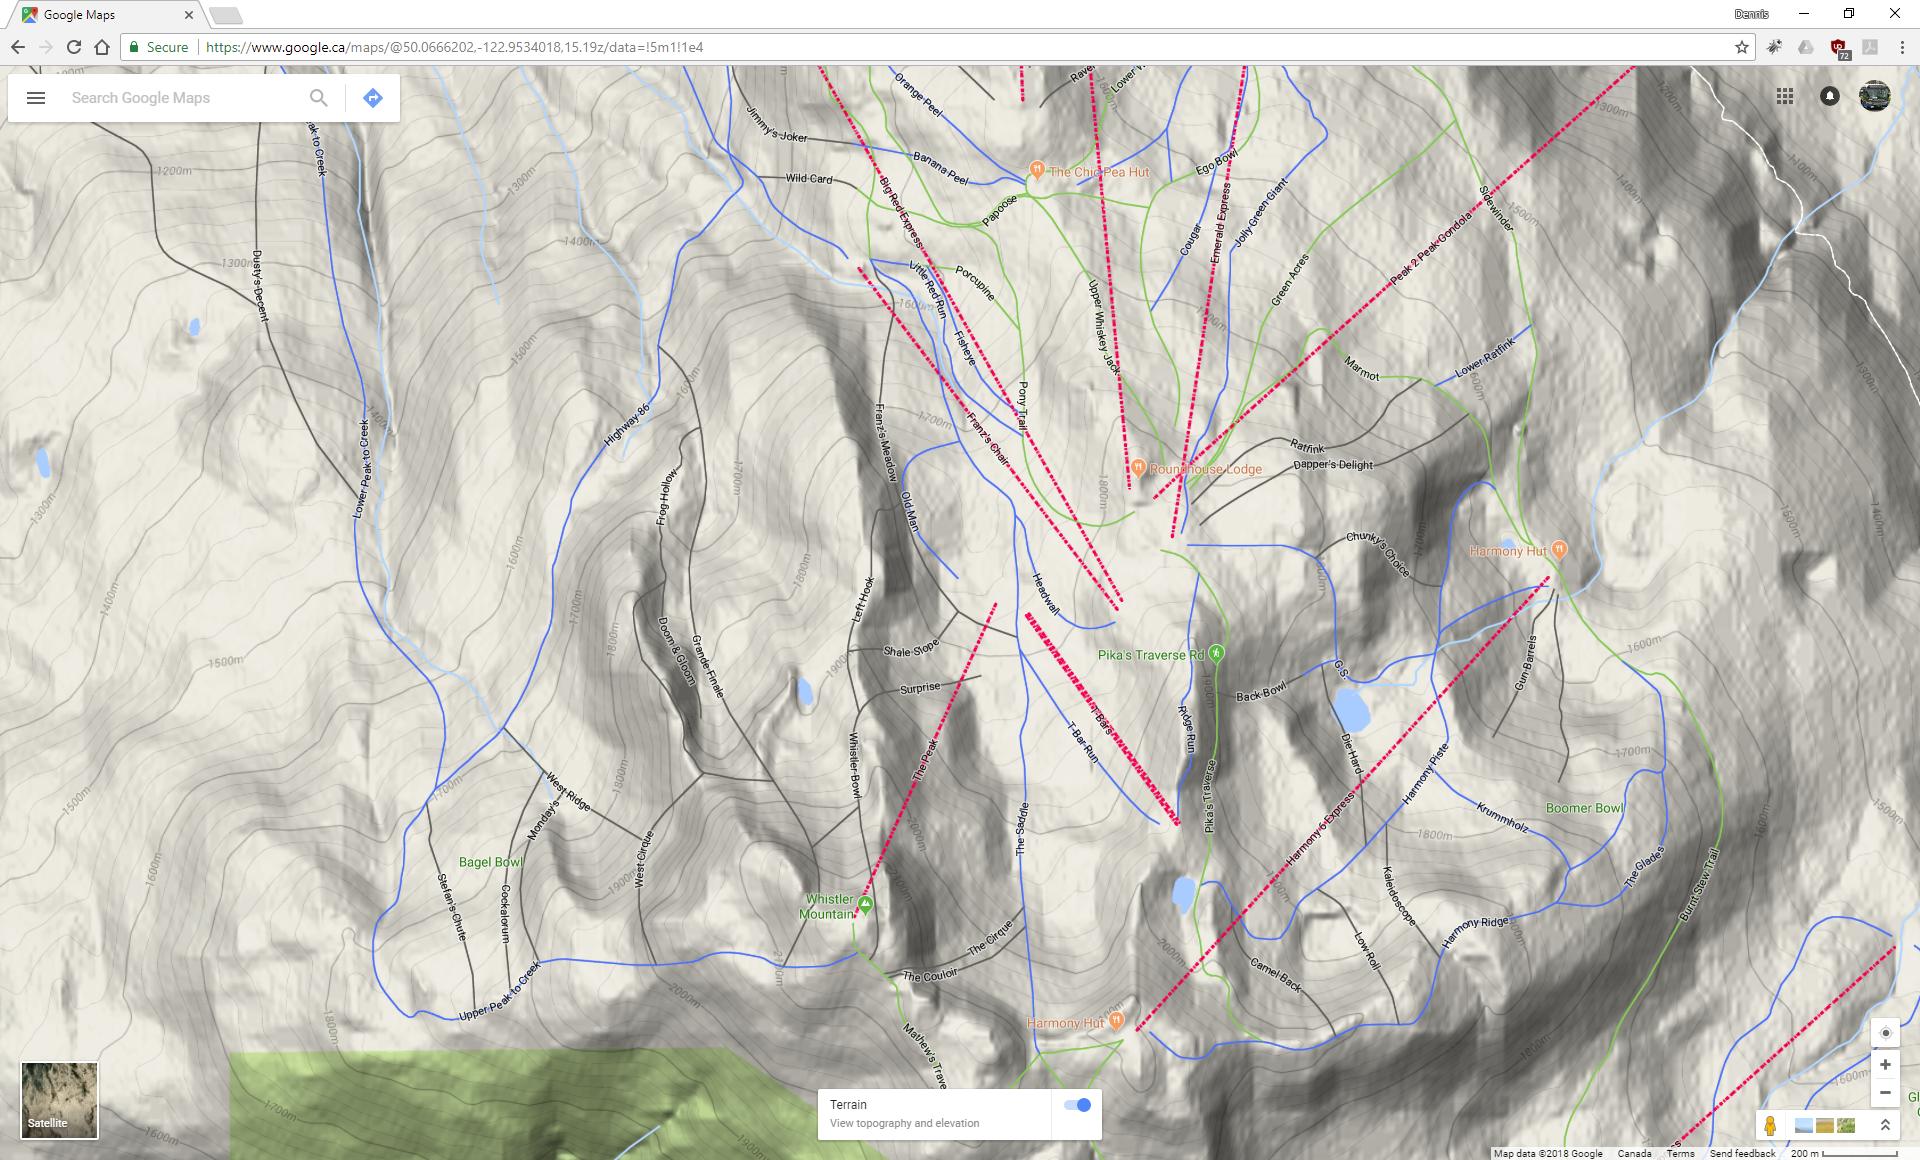 Whistler Ski Run Topographic Map Dennis Tsang - Google maps topographic view